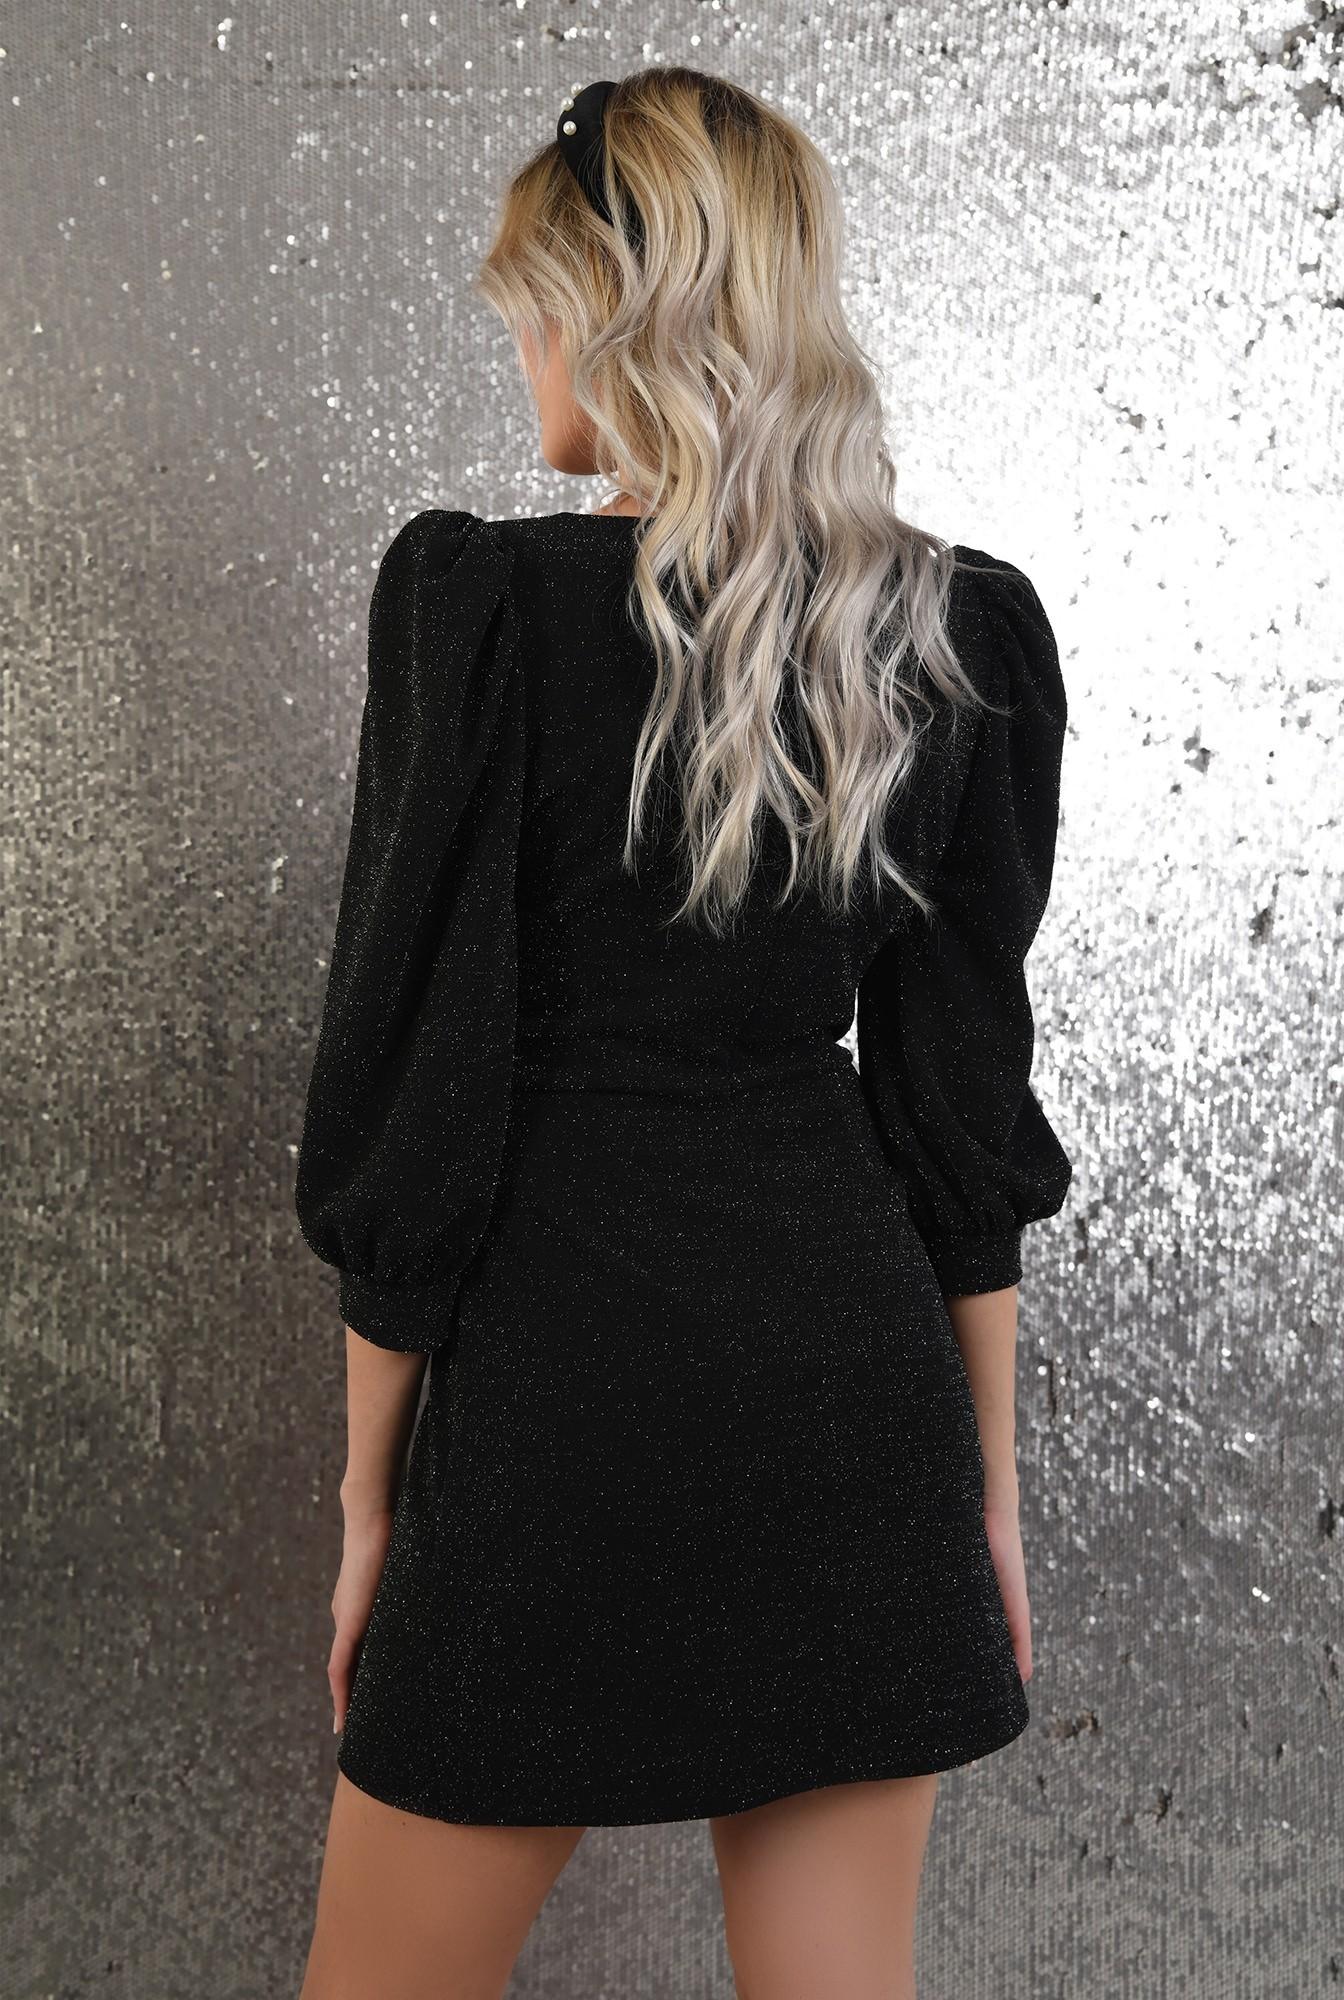 1 - rochie neagra, de ocazie, cu sclipici, anchior, maneci bufante